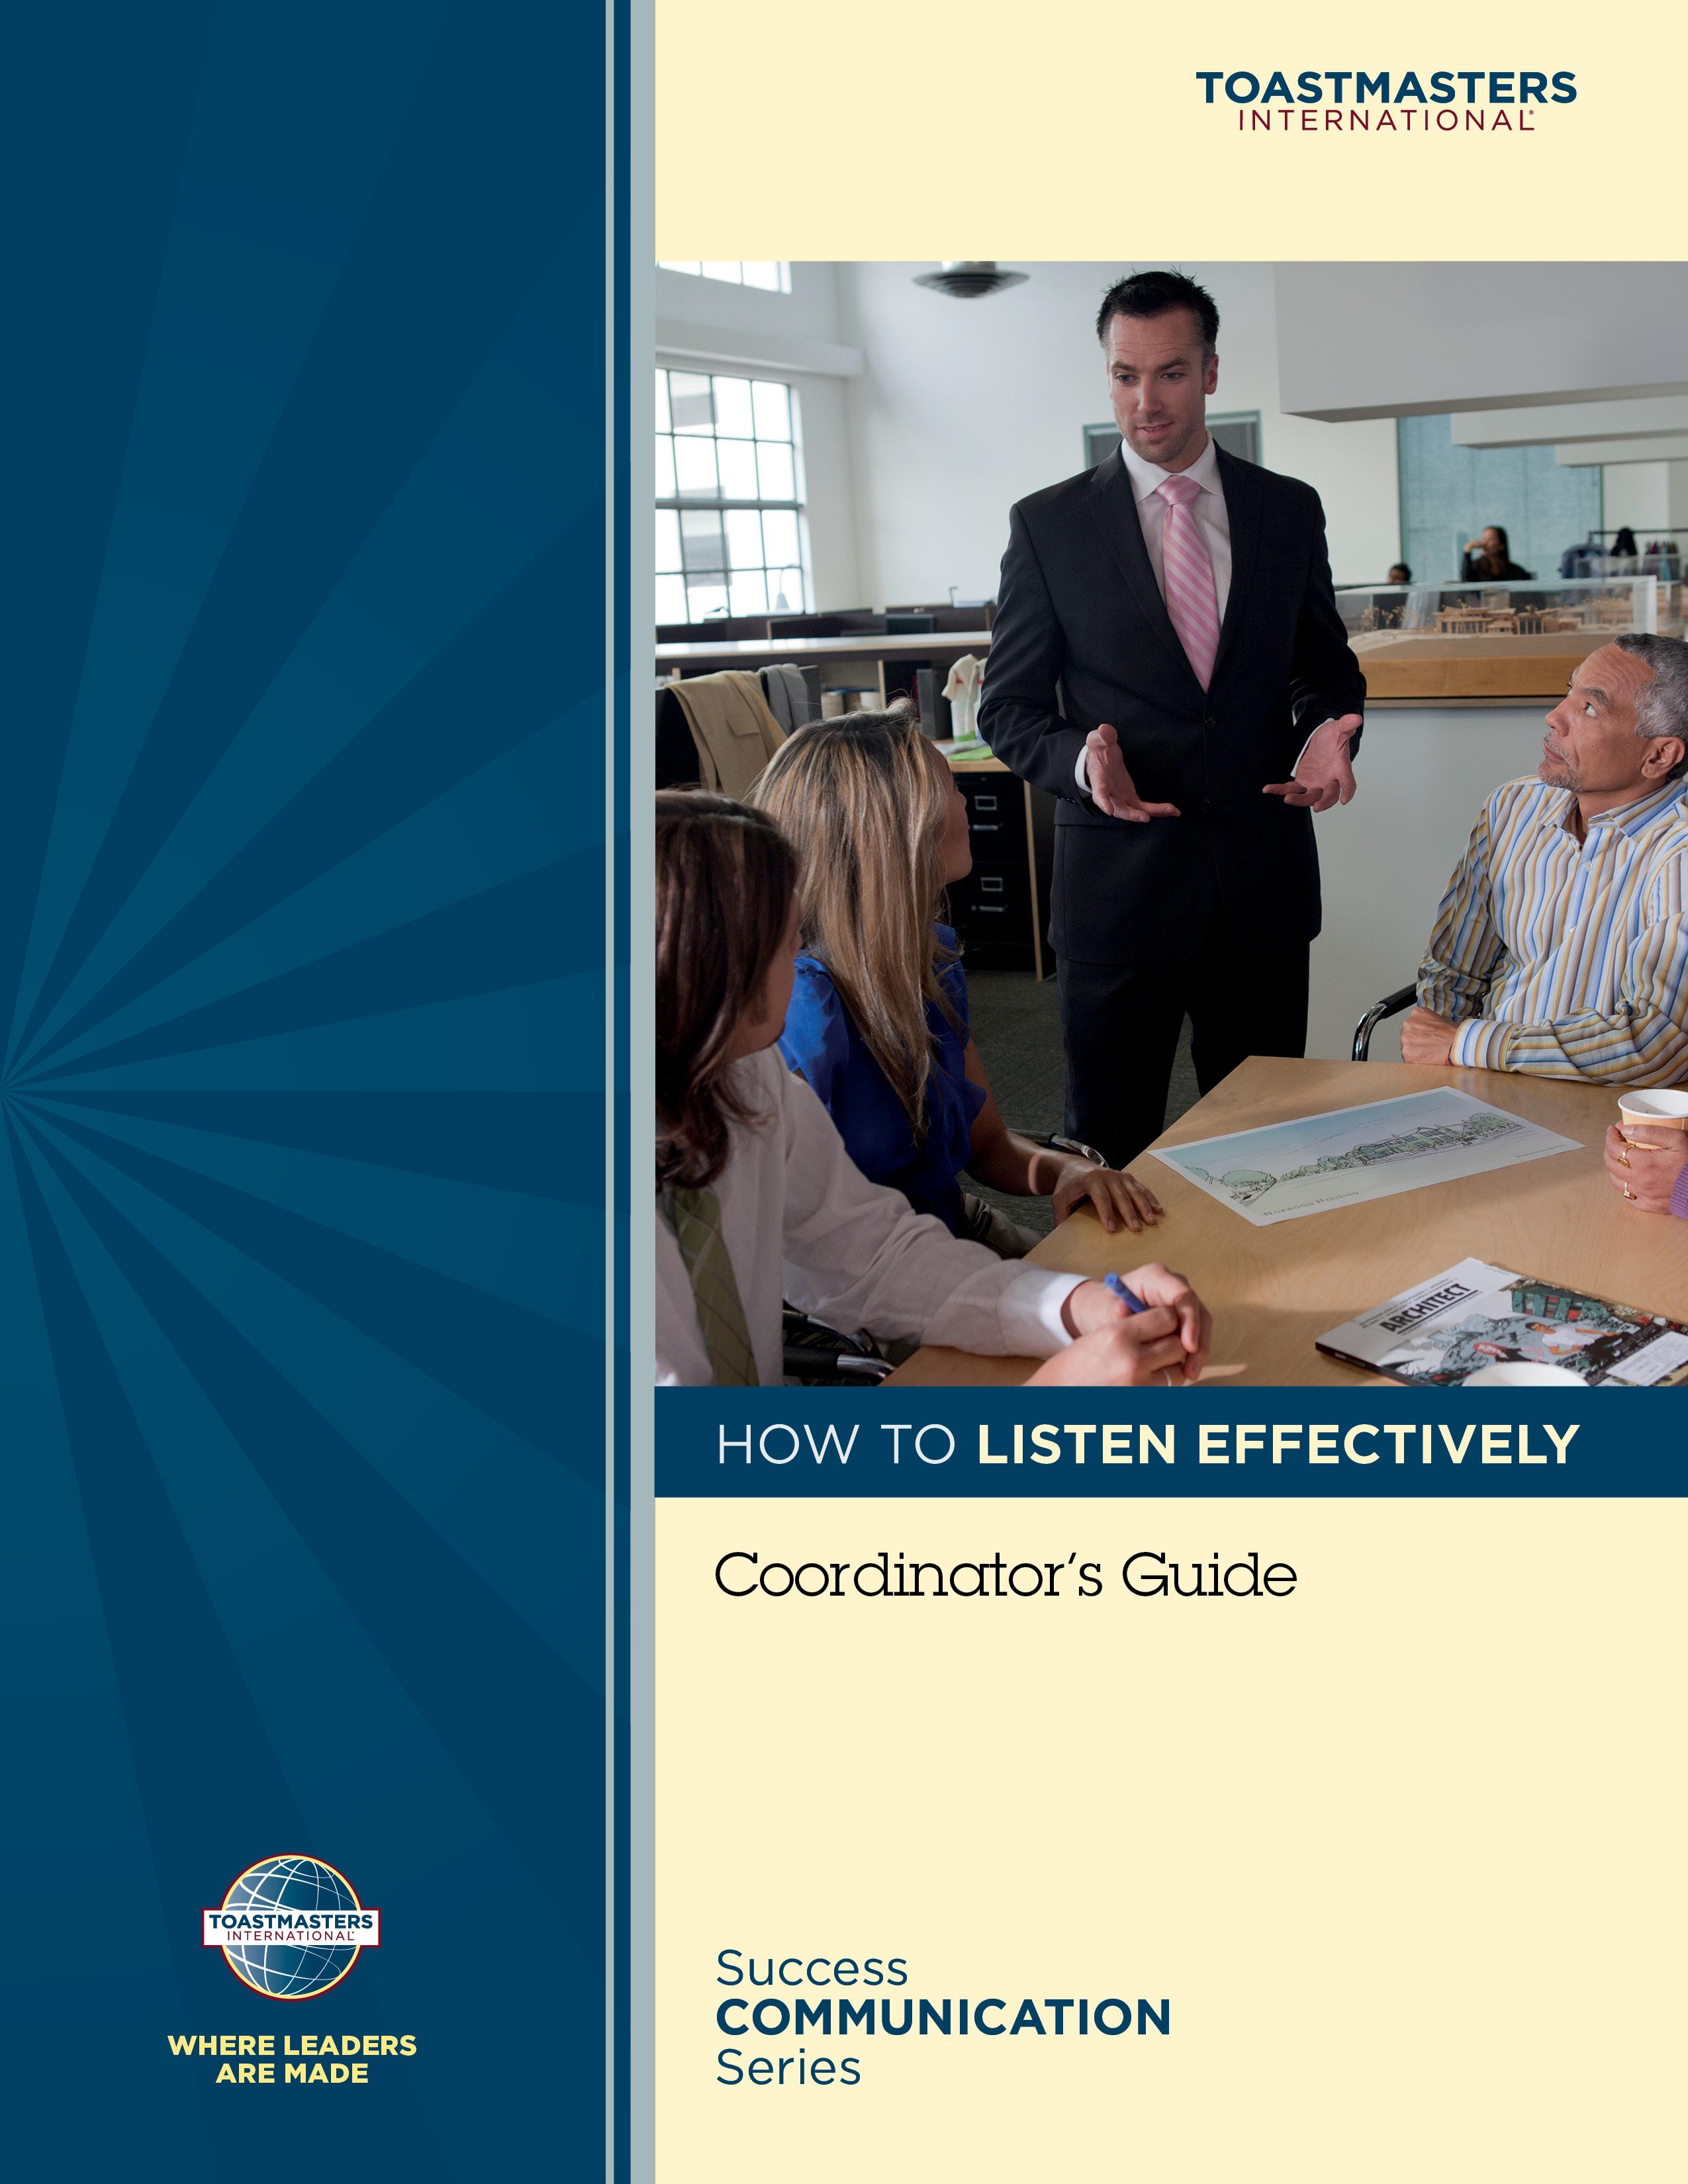 How to Listen Effectively Workshop Coordinator's Guide